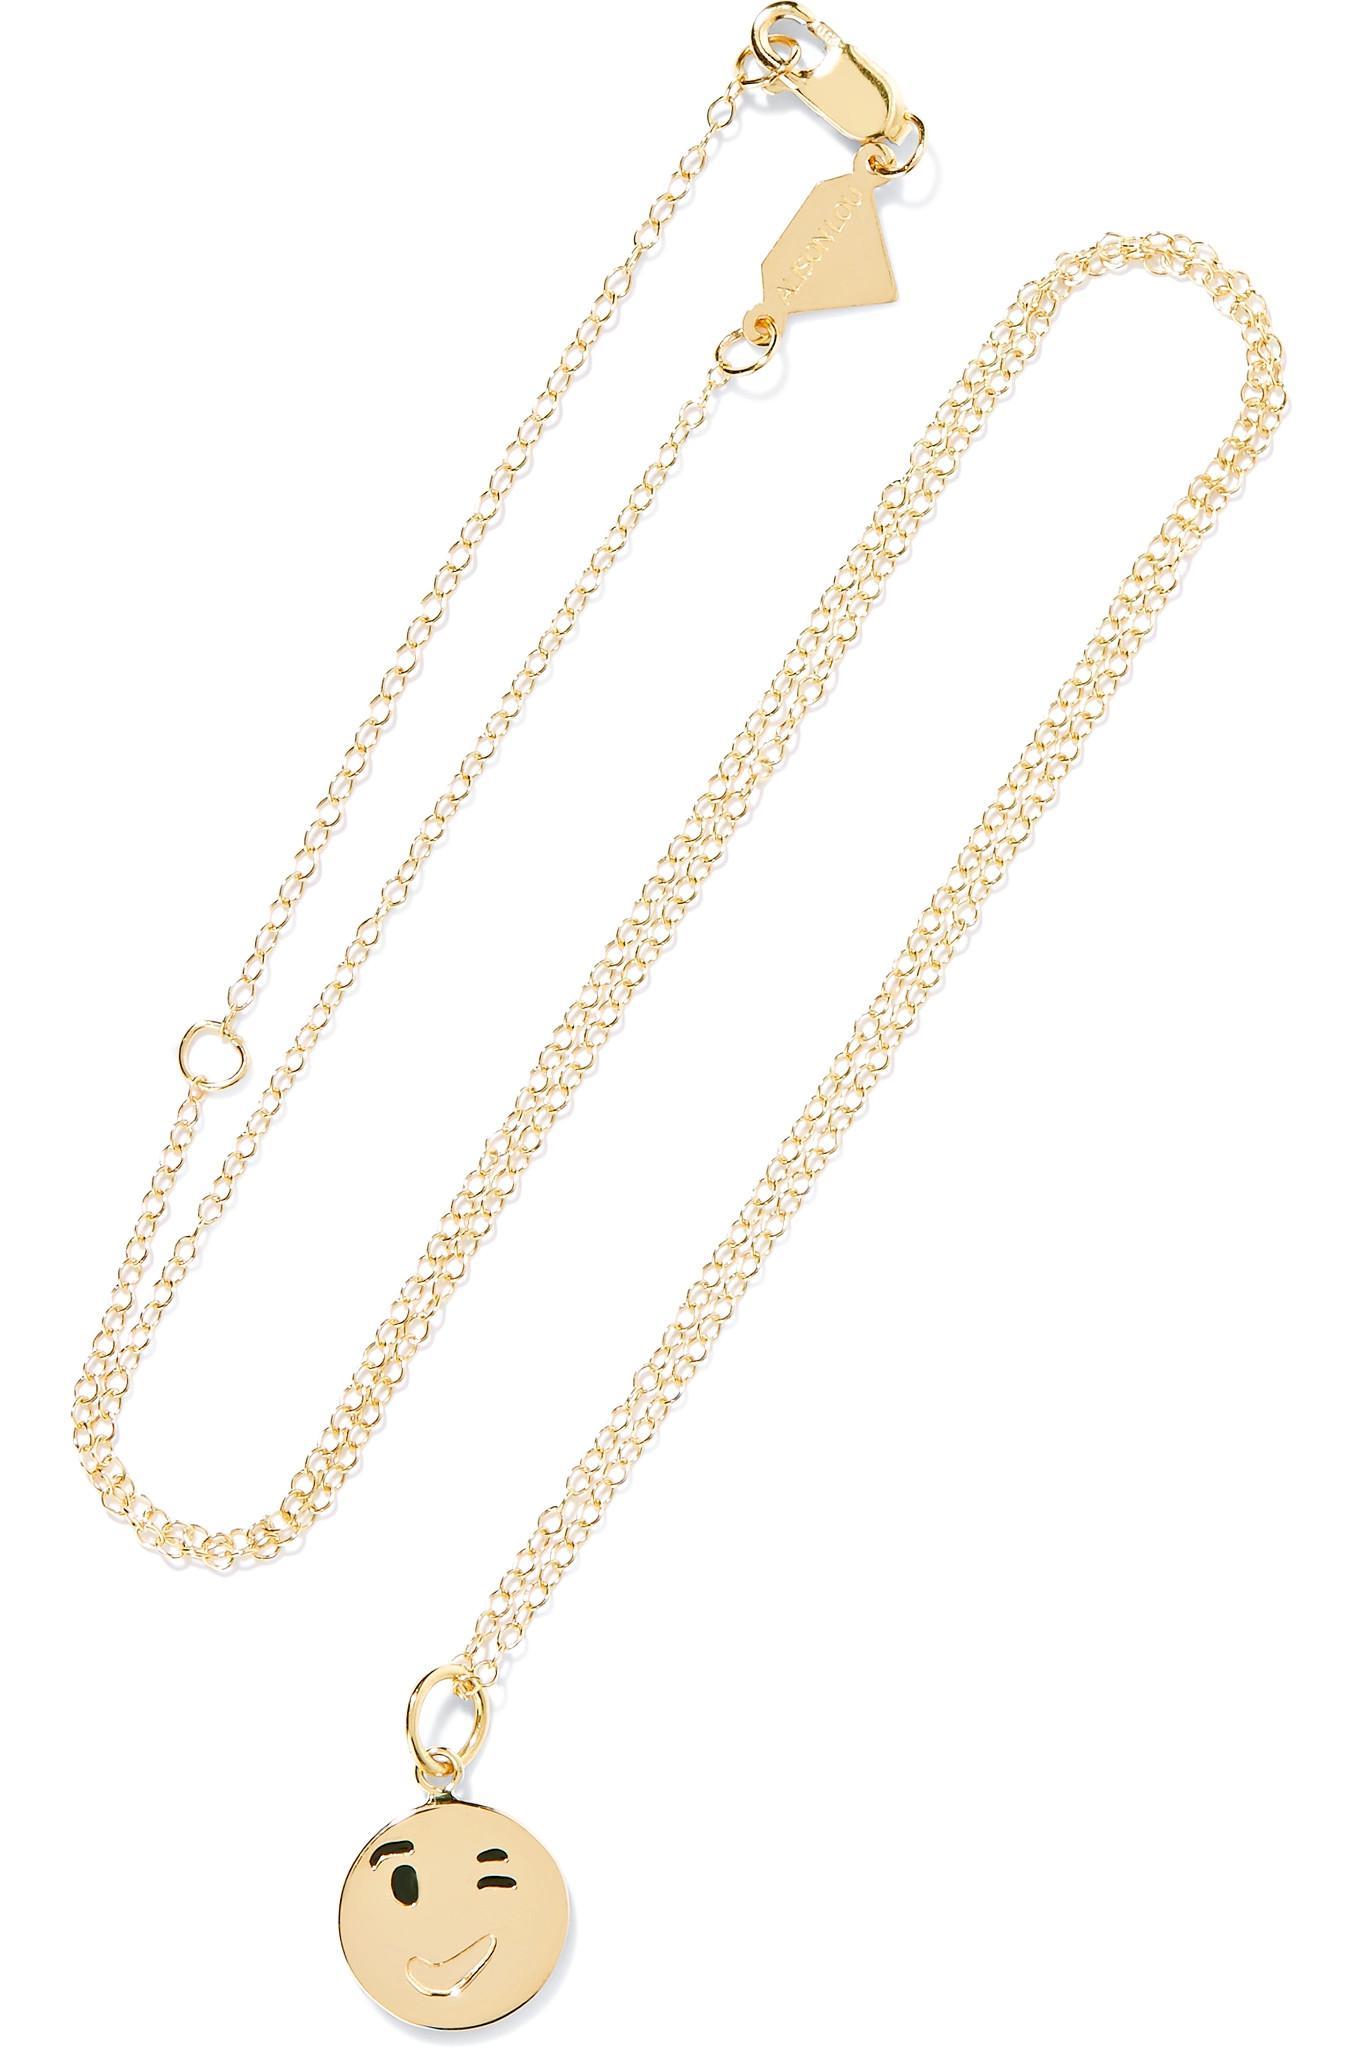 Alison Lou Small Tongue Out Enameled 14-karat Gold Necklace X1rQuGO